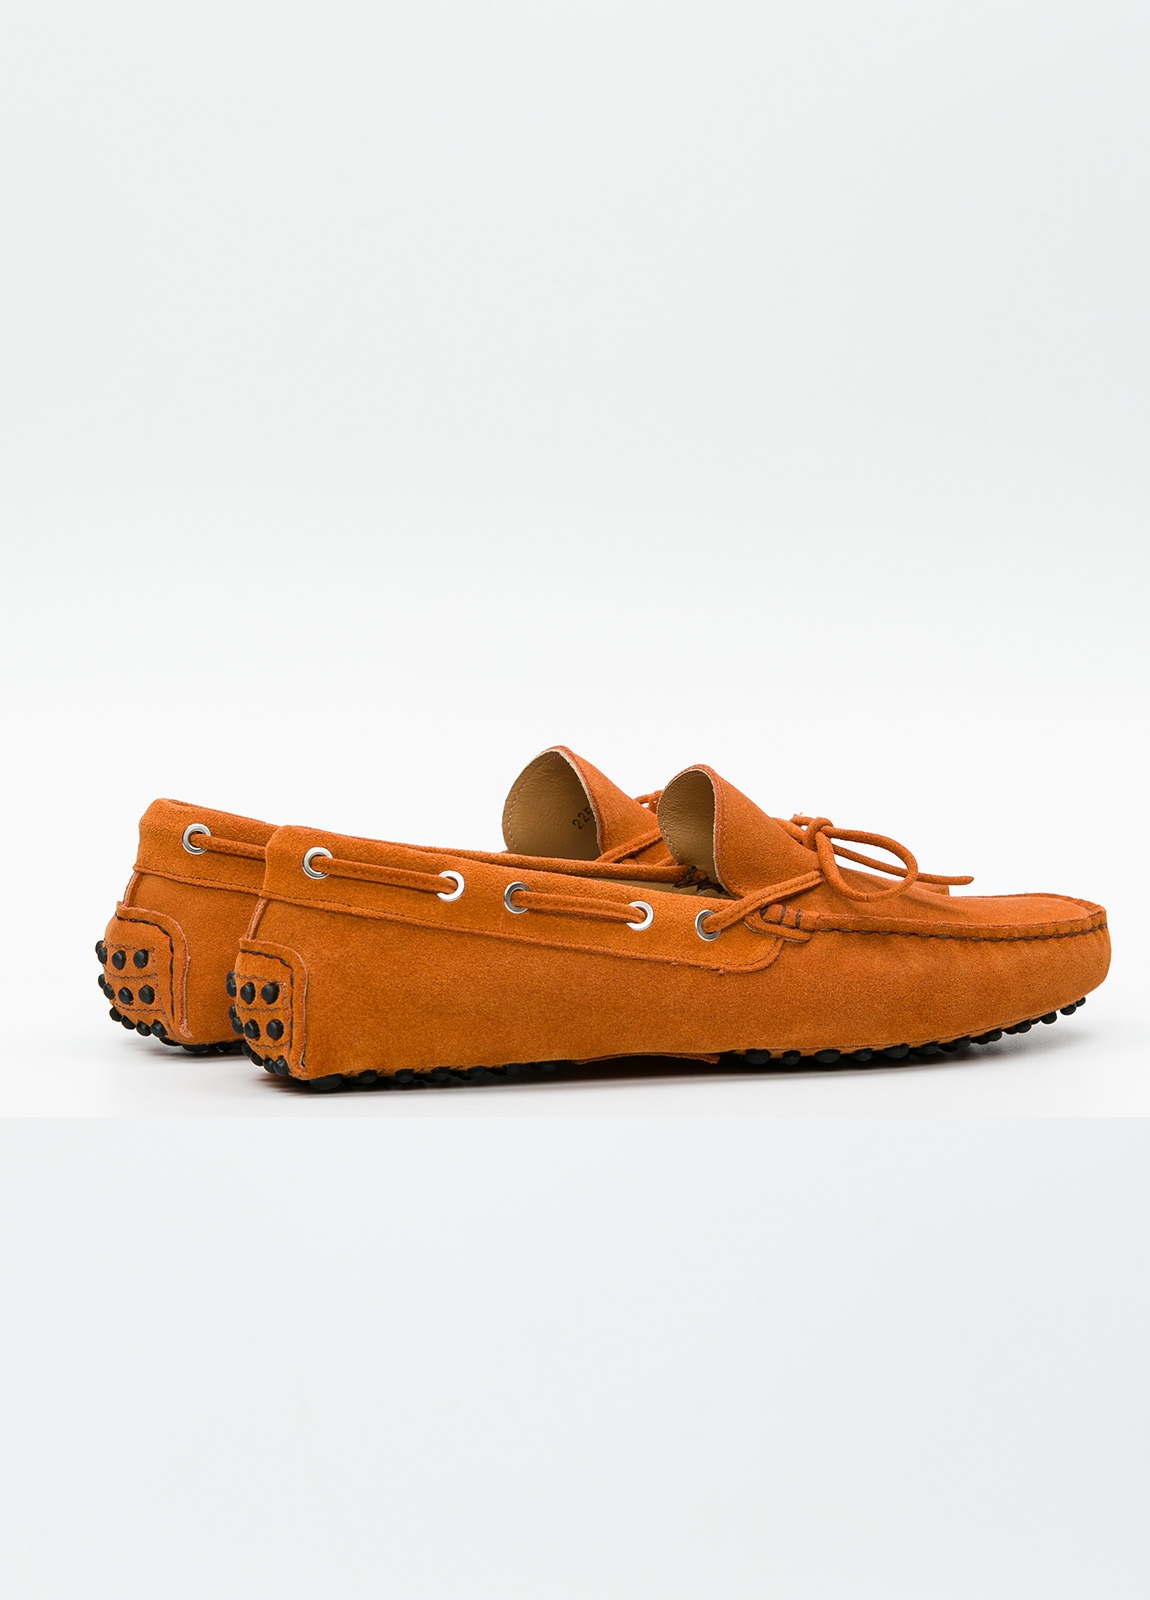 Zapato mocasín Sport color teja, 100% Piel. - Ítem1